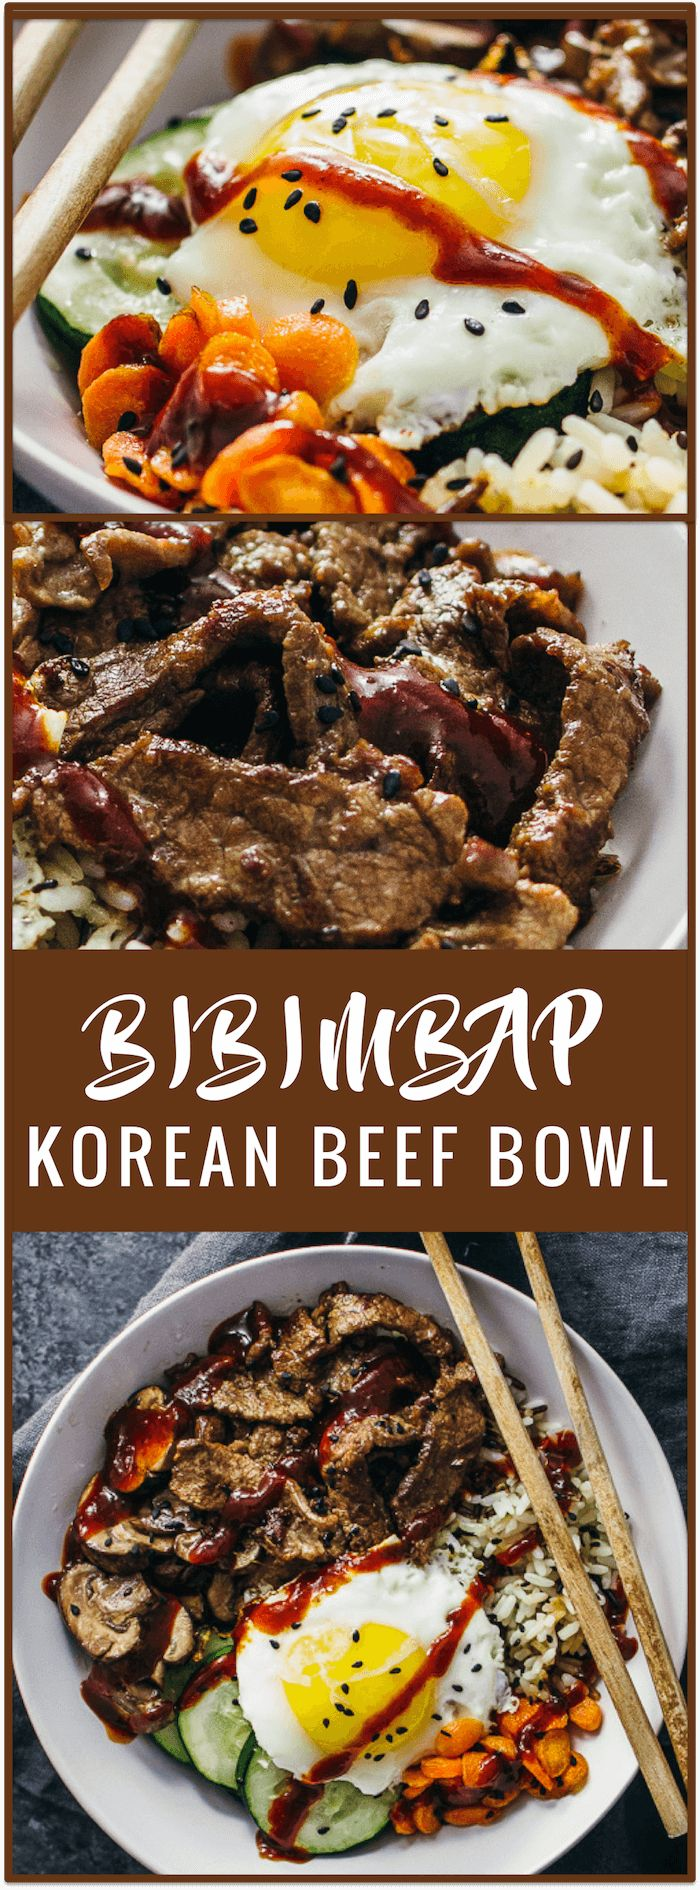 bibimbap   korean beef bowl   korean rice bowl   bibimbap sauce   bibimbap bowl   how to eat bibimbap   korean beef marinade   easy recipe   asian beef   asian bowl   spicy   sponsored #riceonthego via @savory tooth